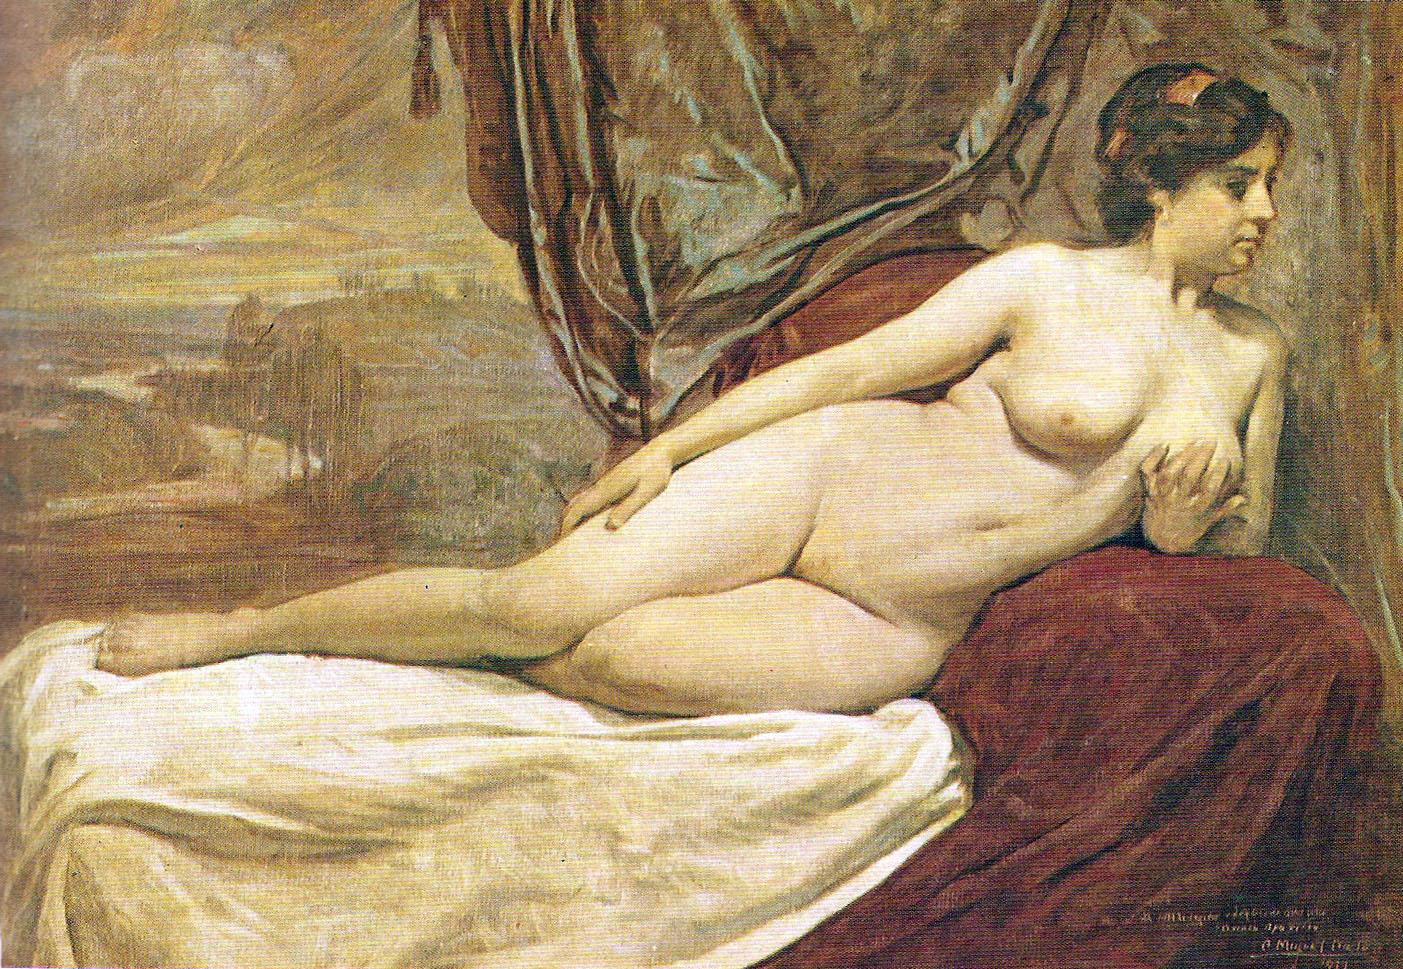 Mujer, romntico, desnudo, rosas, tenencia, rojo Mujer